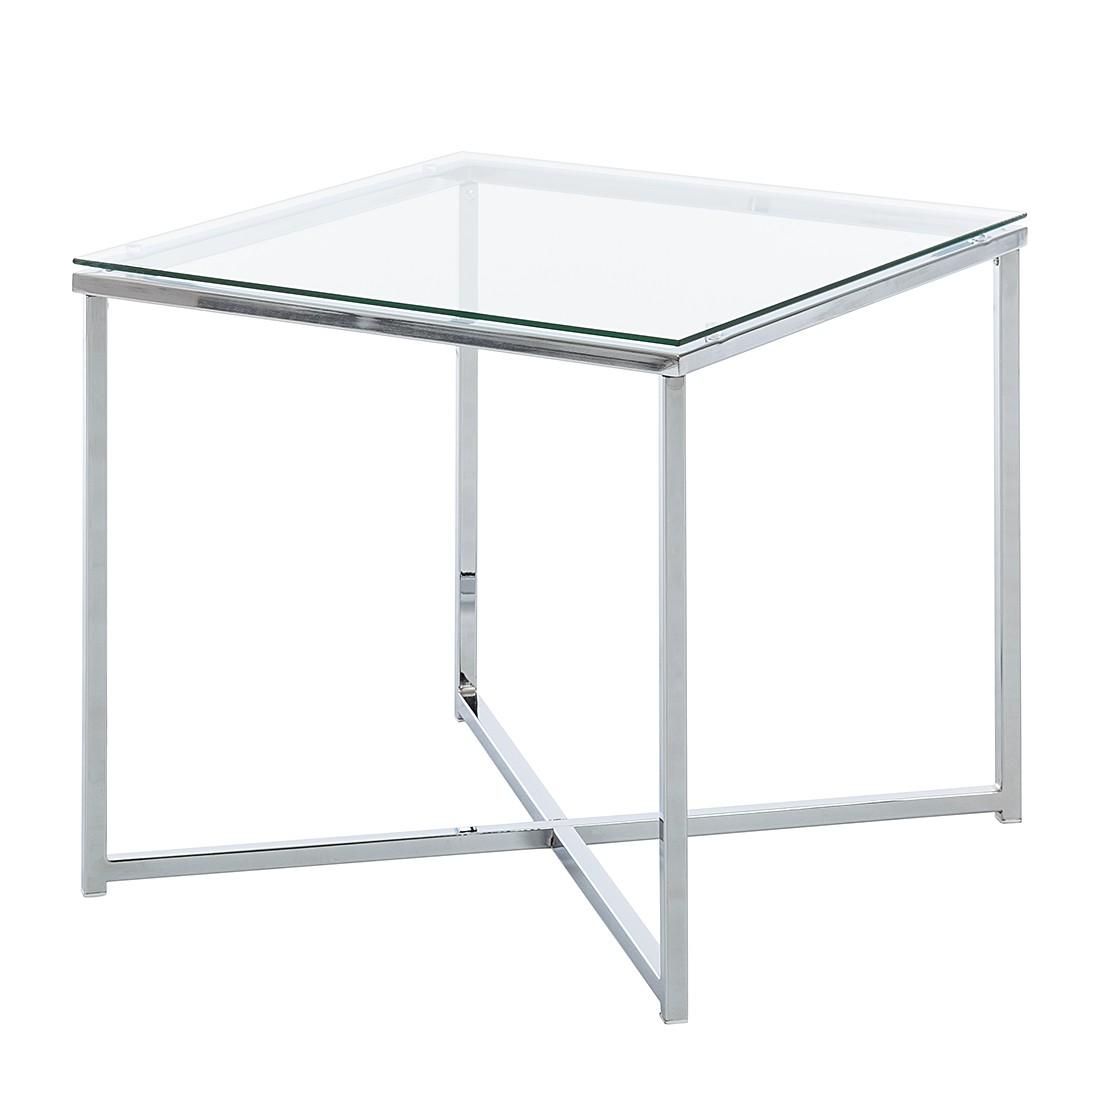 Tavolino Cross - Vetro trasparente angolare, Fredriks